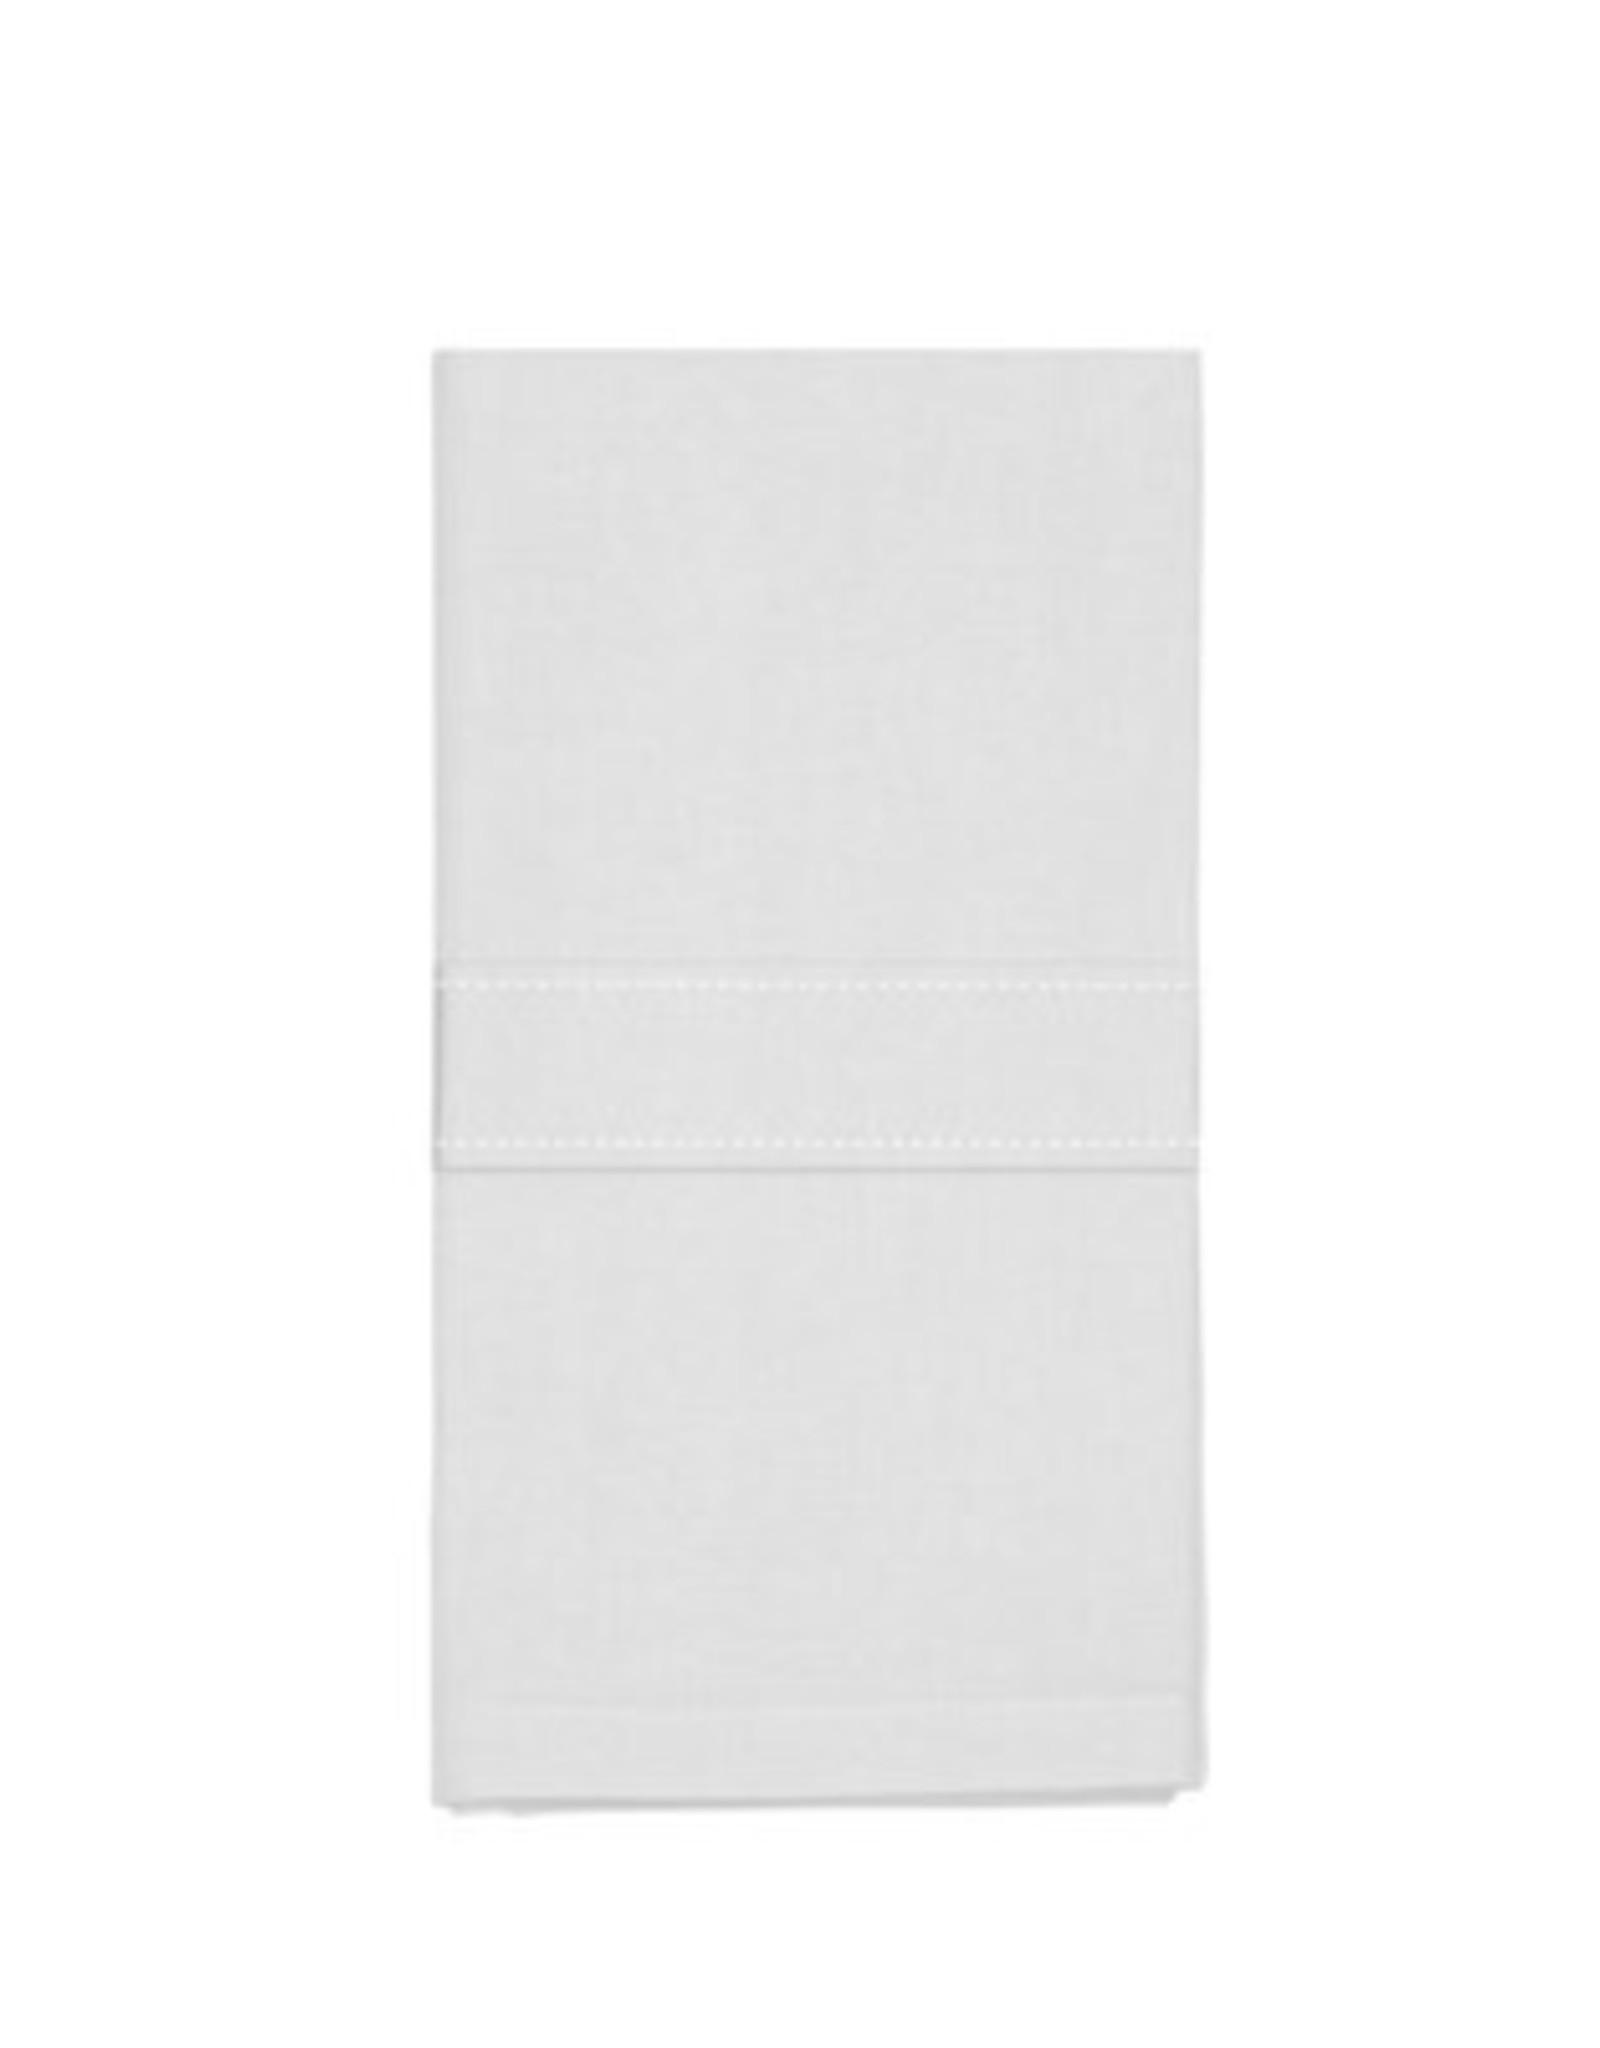 Napkins Harman Stock Solid Set of 4 White